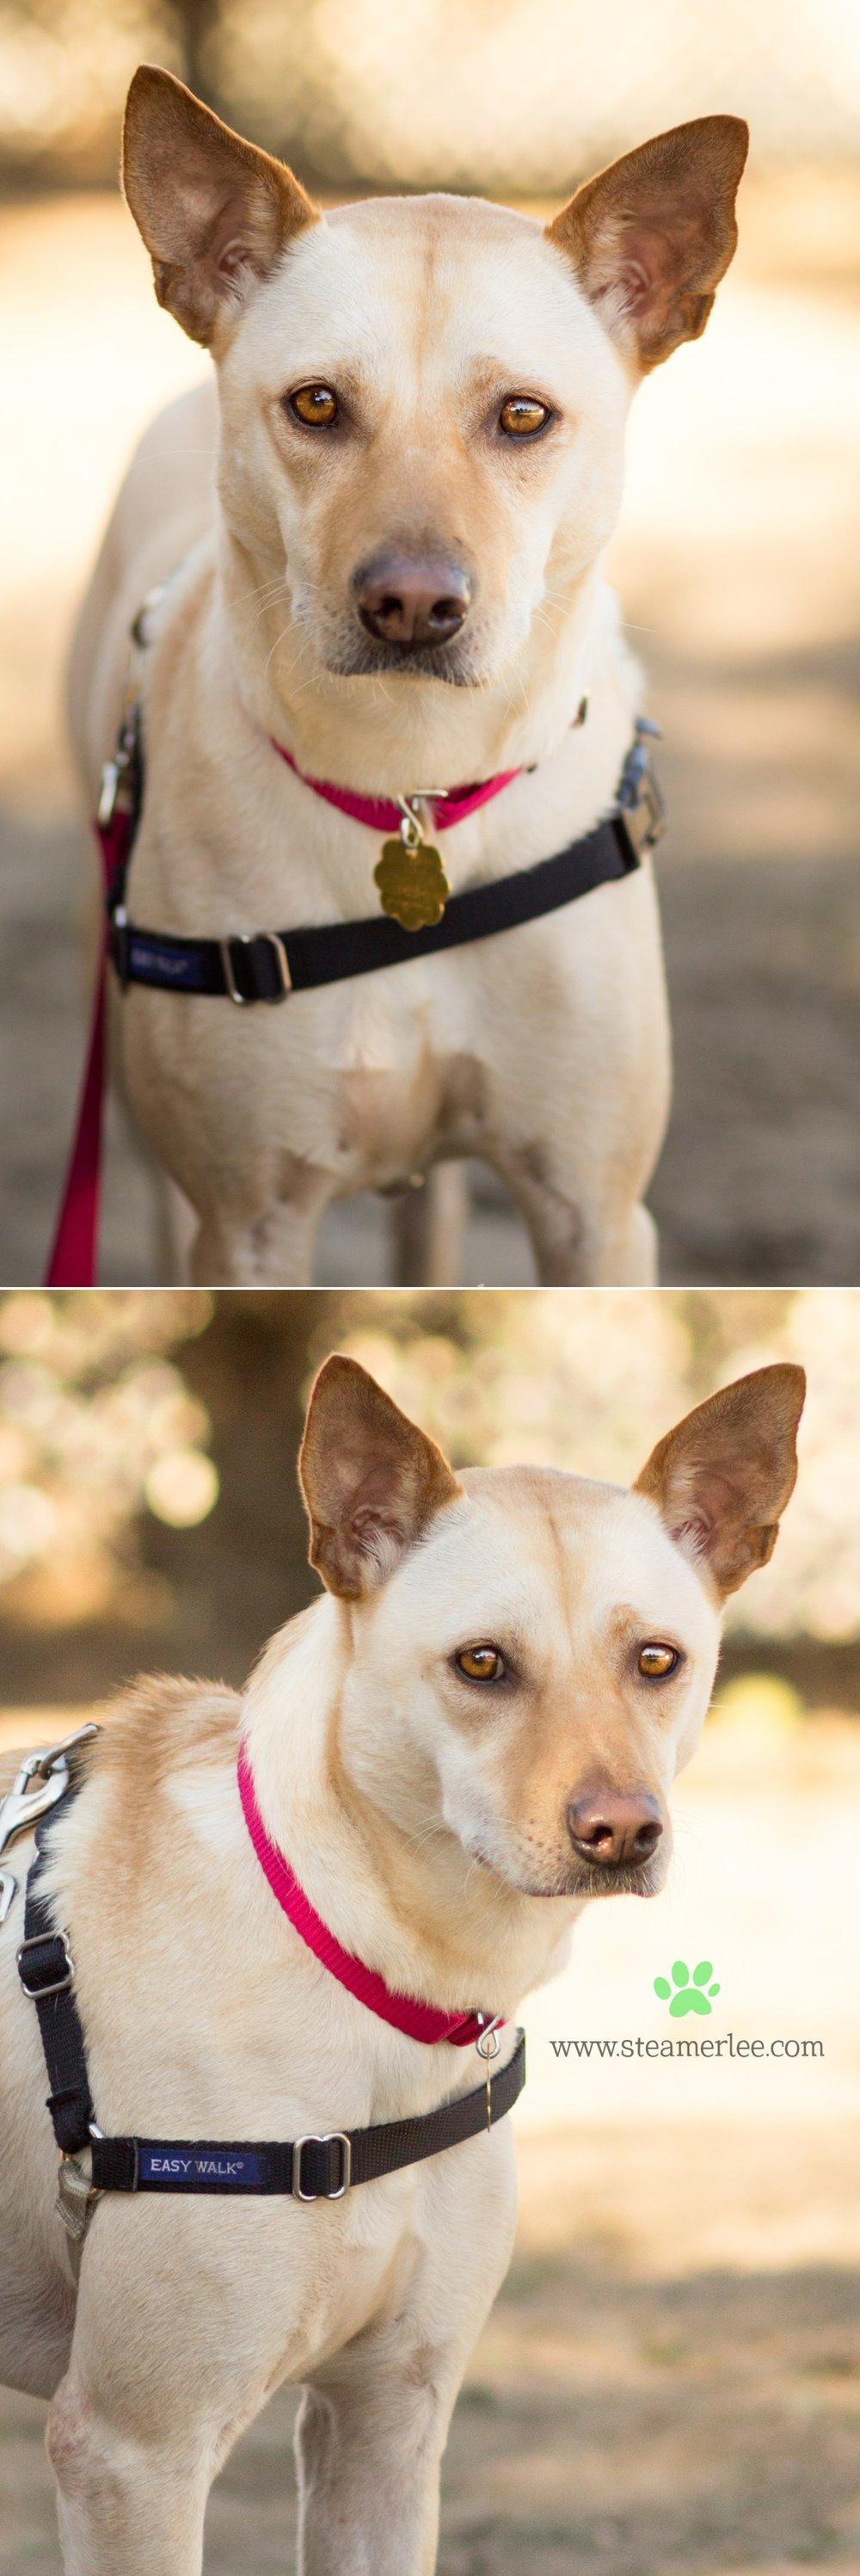 02 Steamer Lee Dog Photography - Seal Beach Animal Care Center.JPG